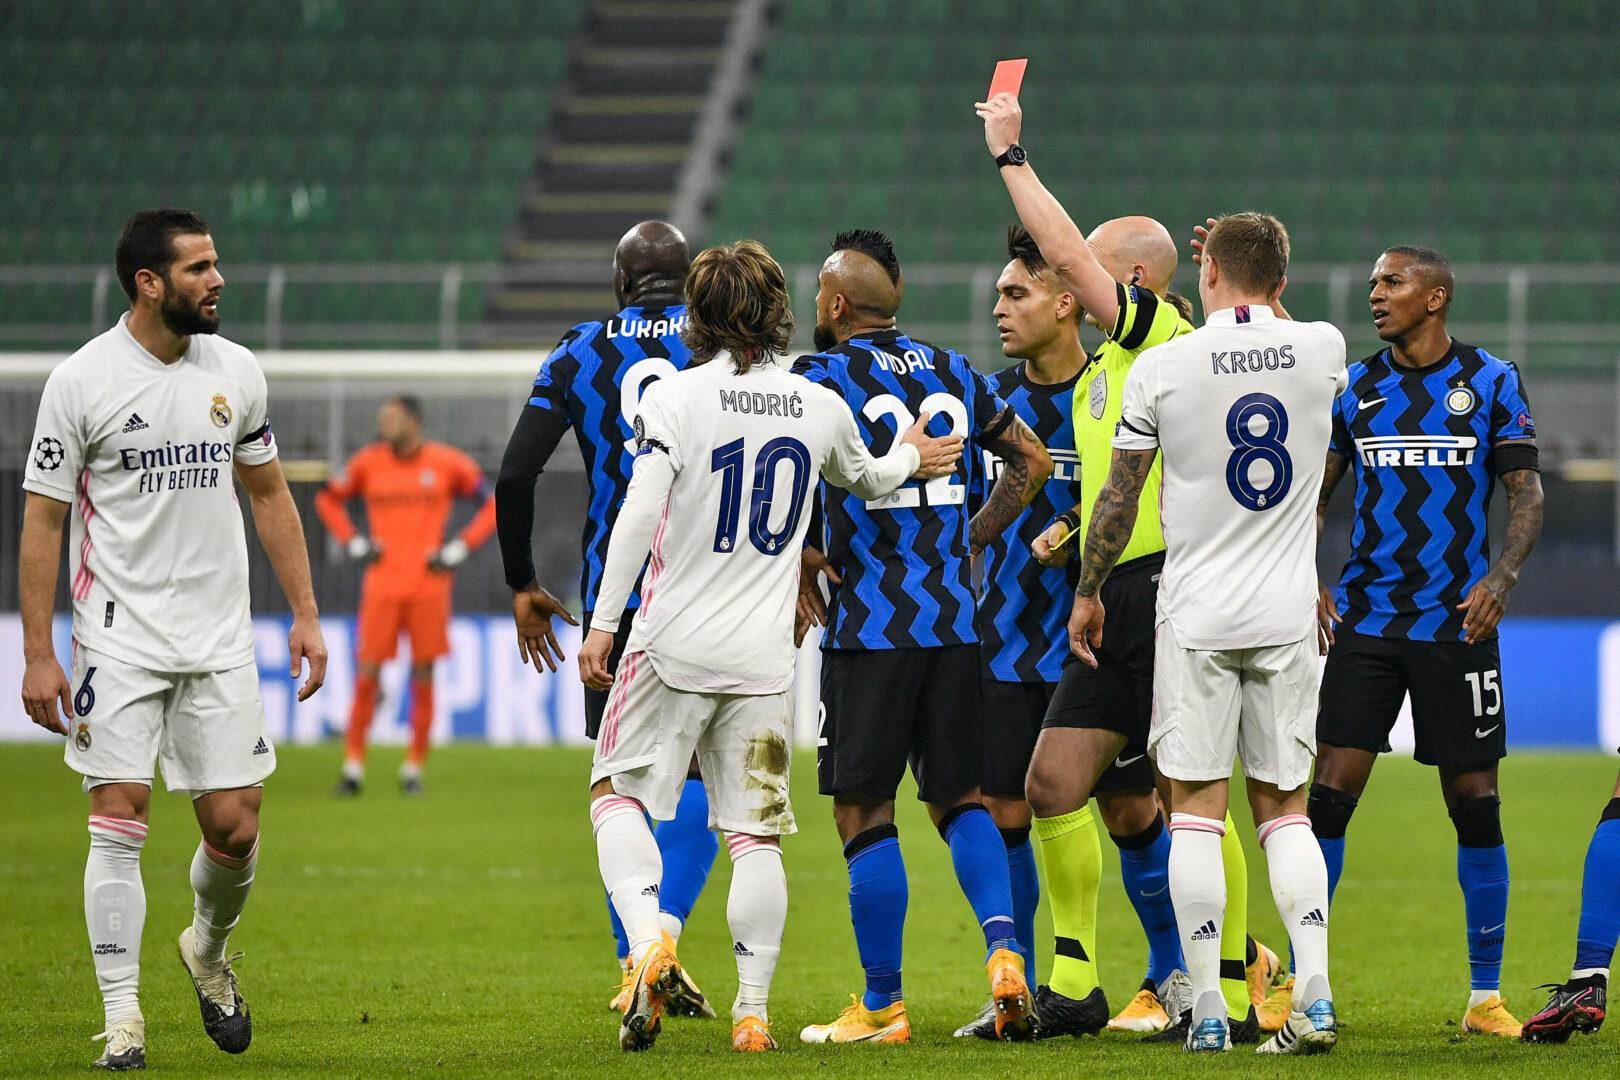 Champions League: Gruppe D mit Inter, Real Madrid, Shakhtar und Neuling Sheriff Tiraspol